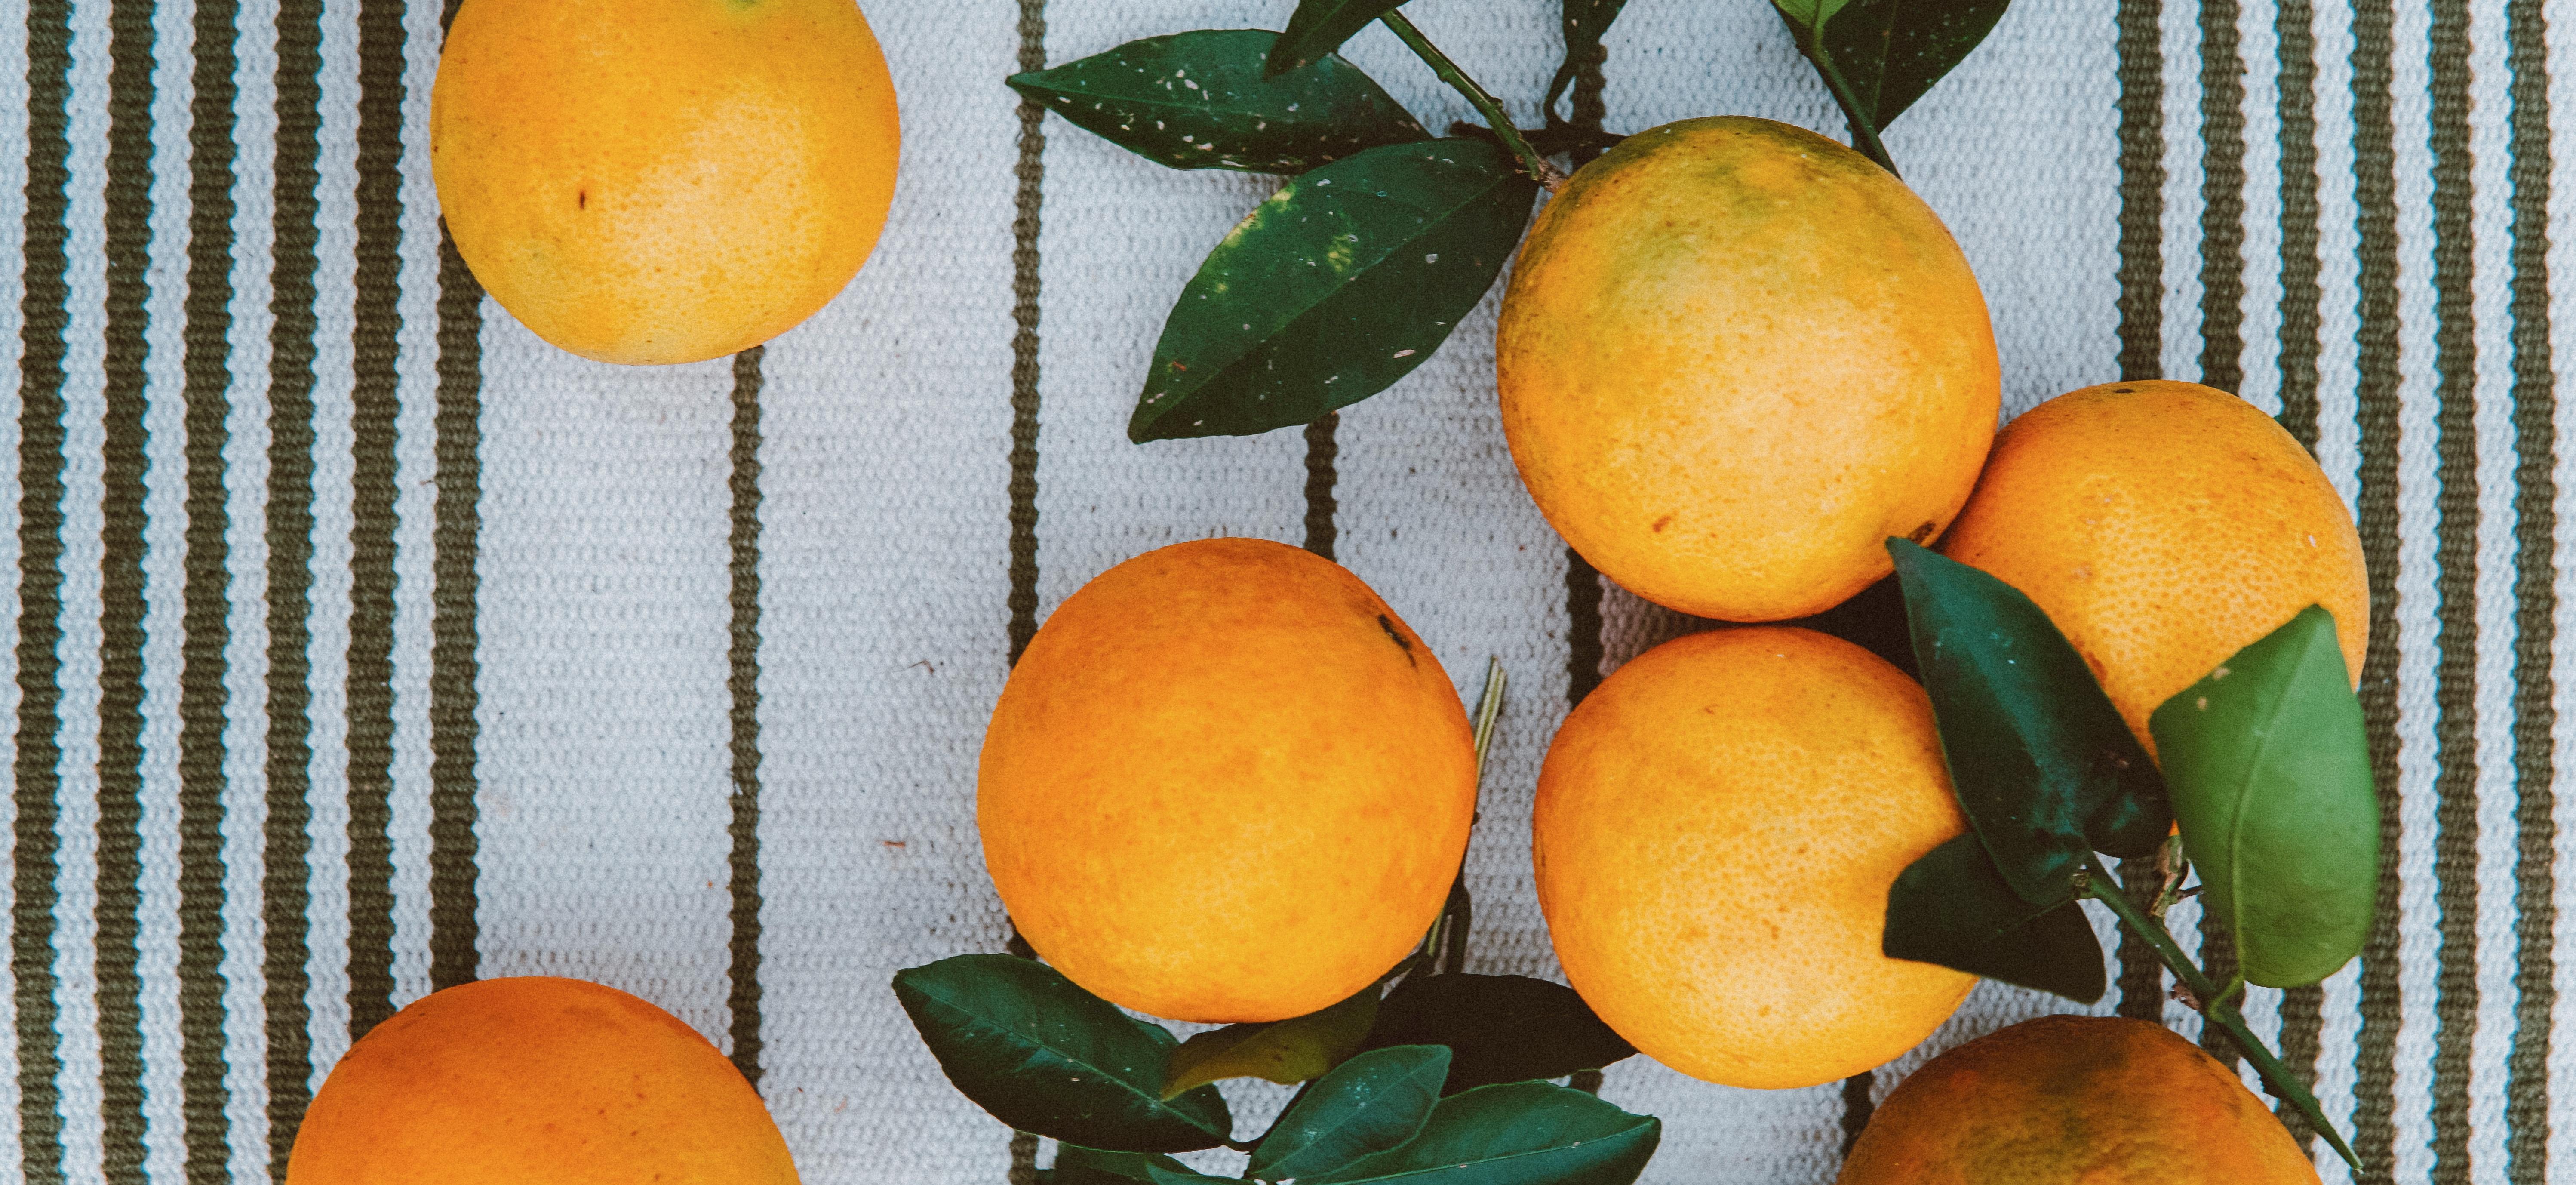 Recept: sinaasappelconfituur